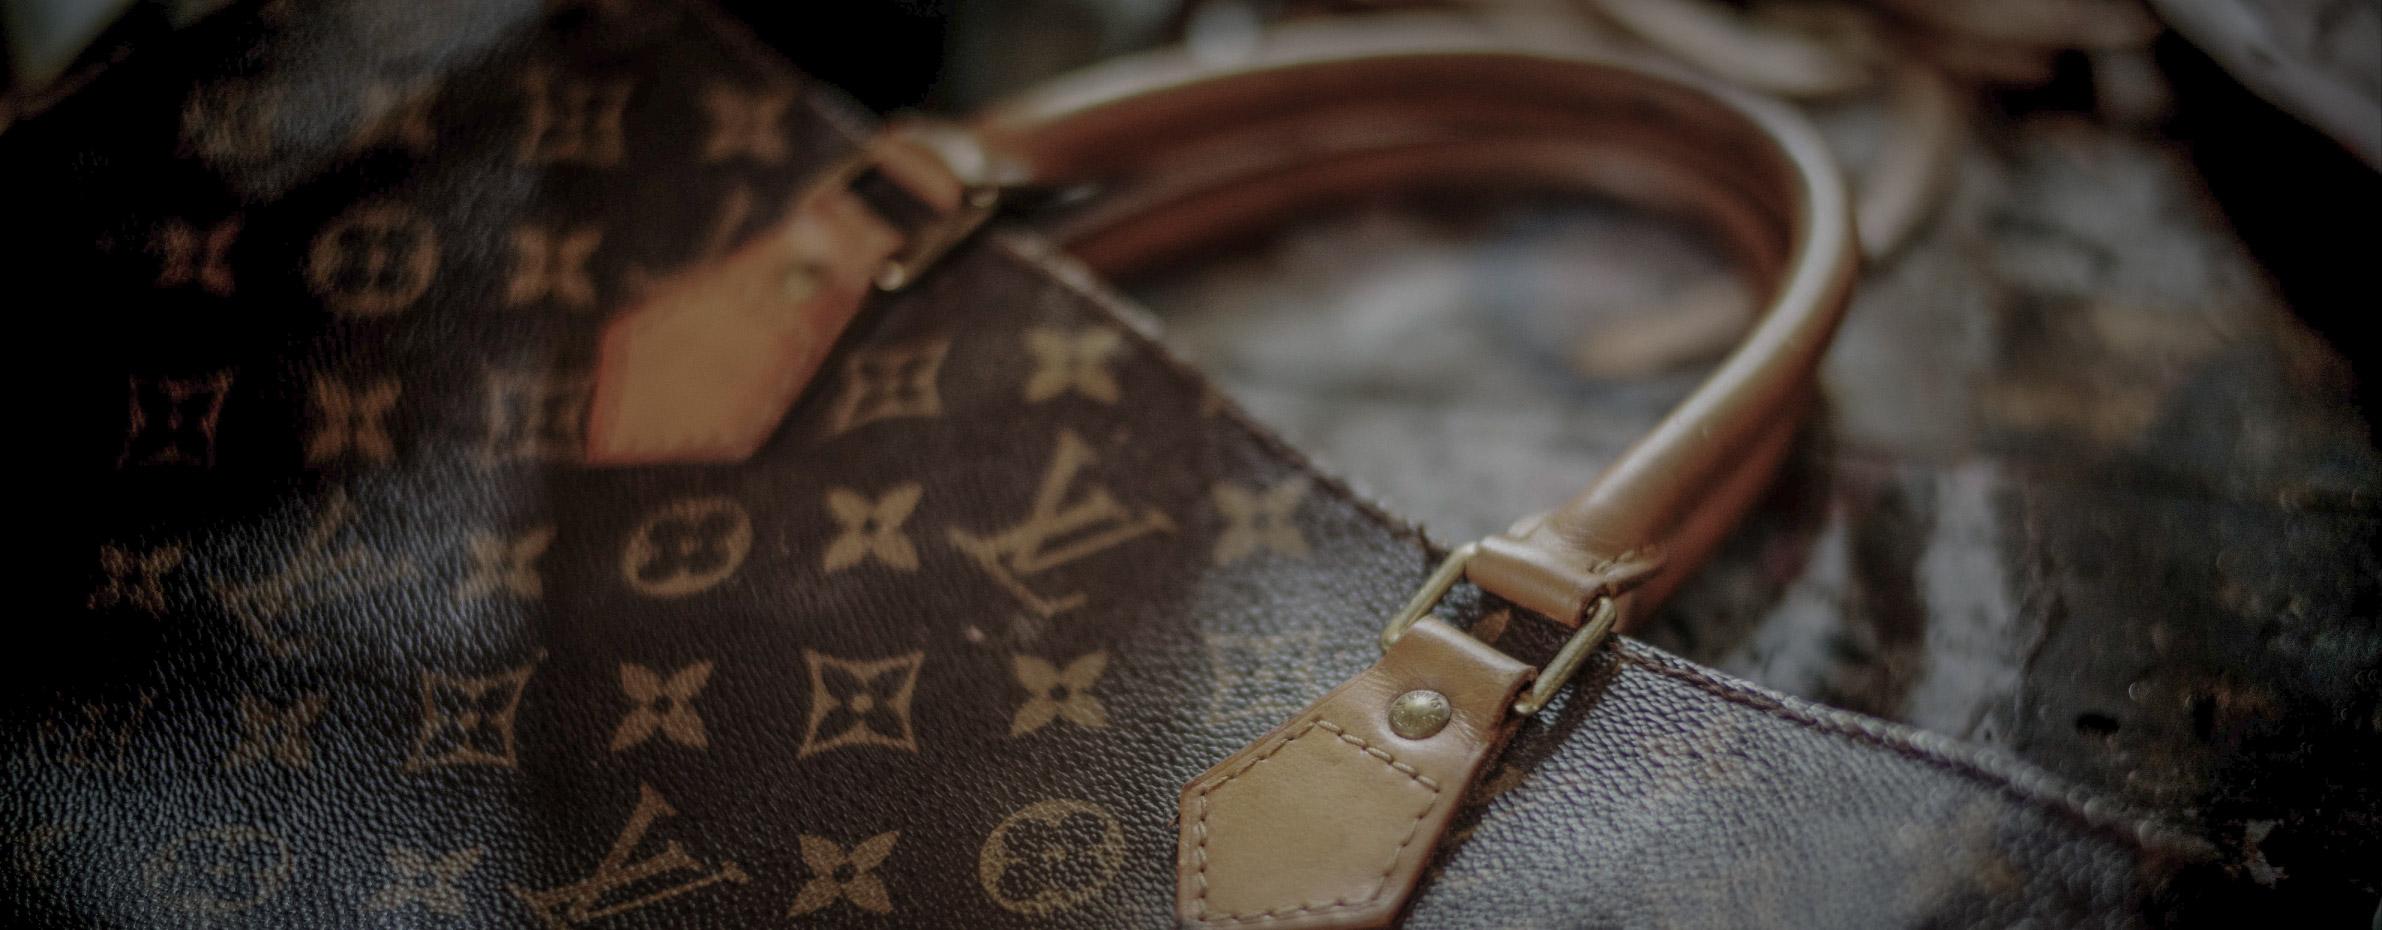 How to Repair Damaged Louis Vuitton Bag